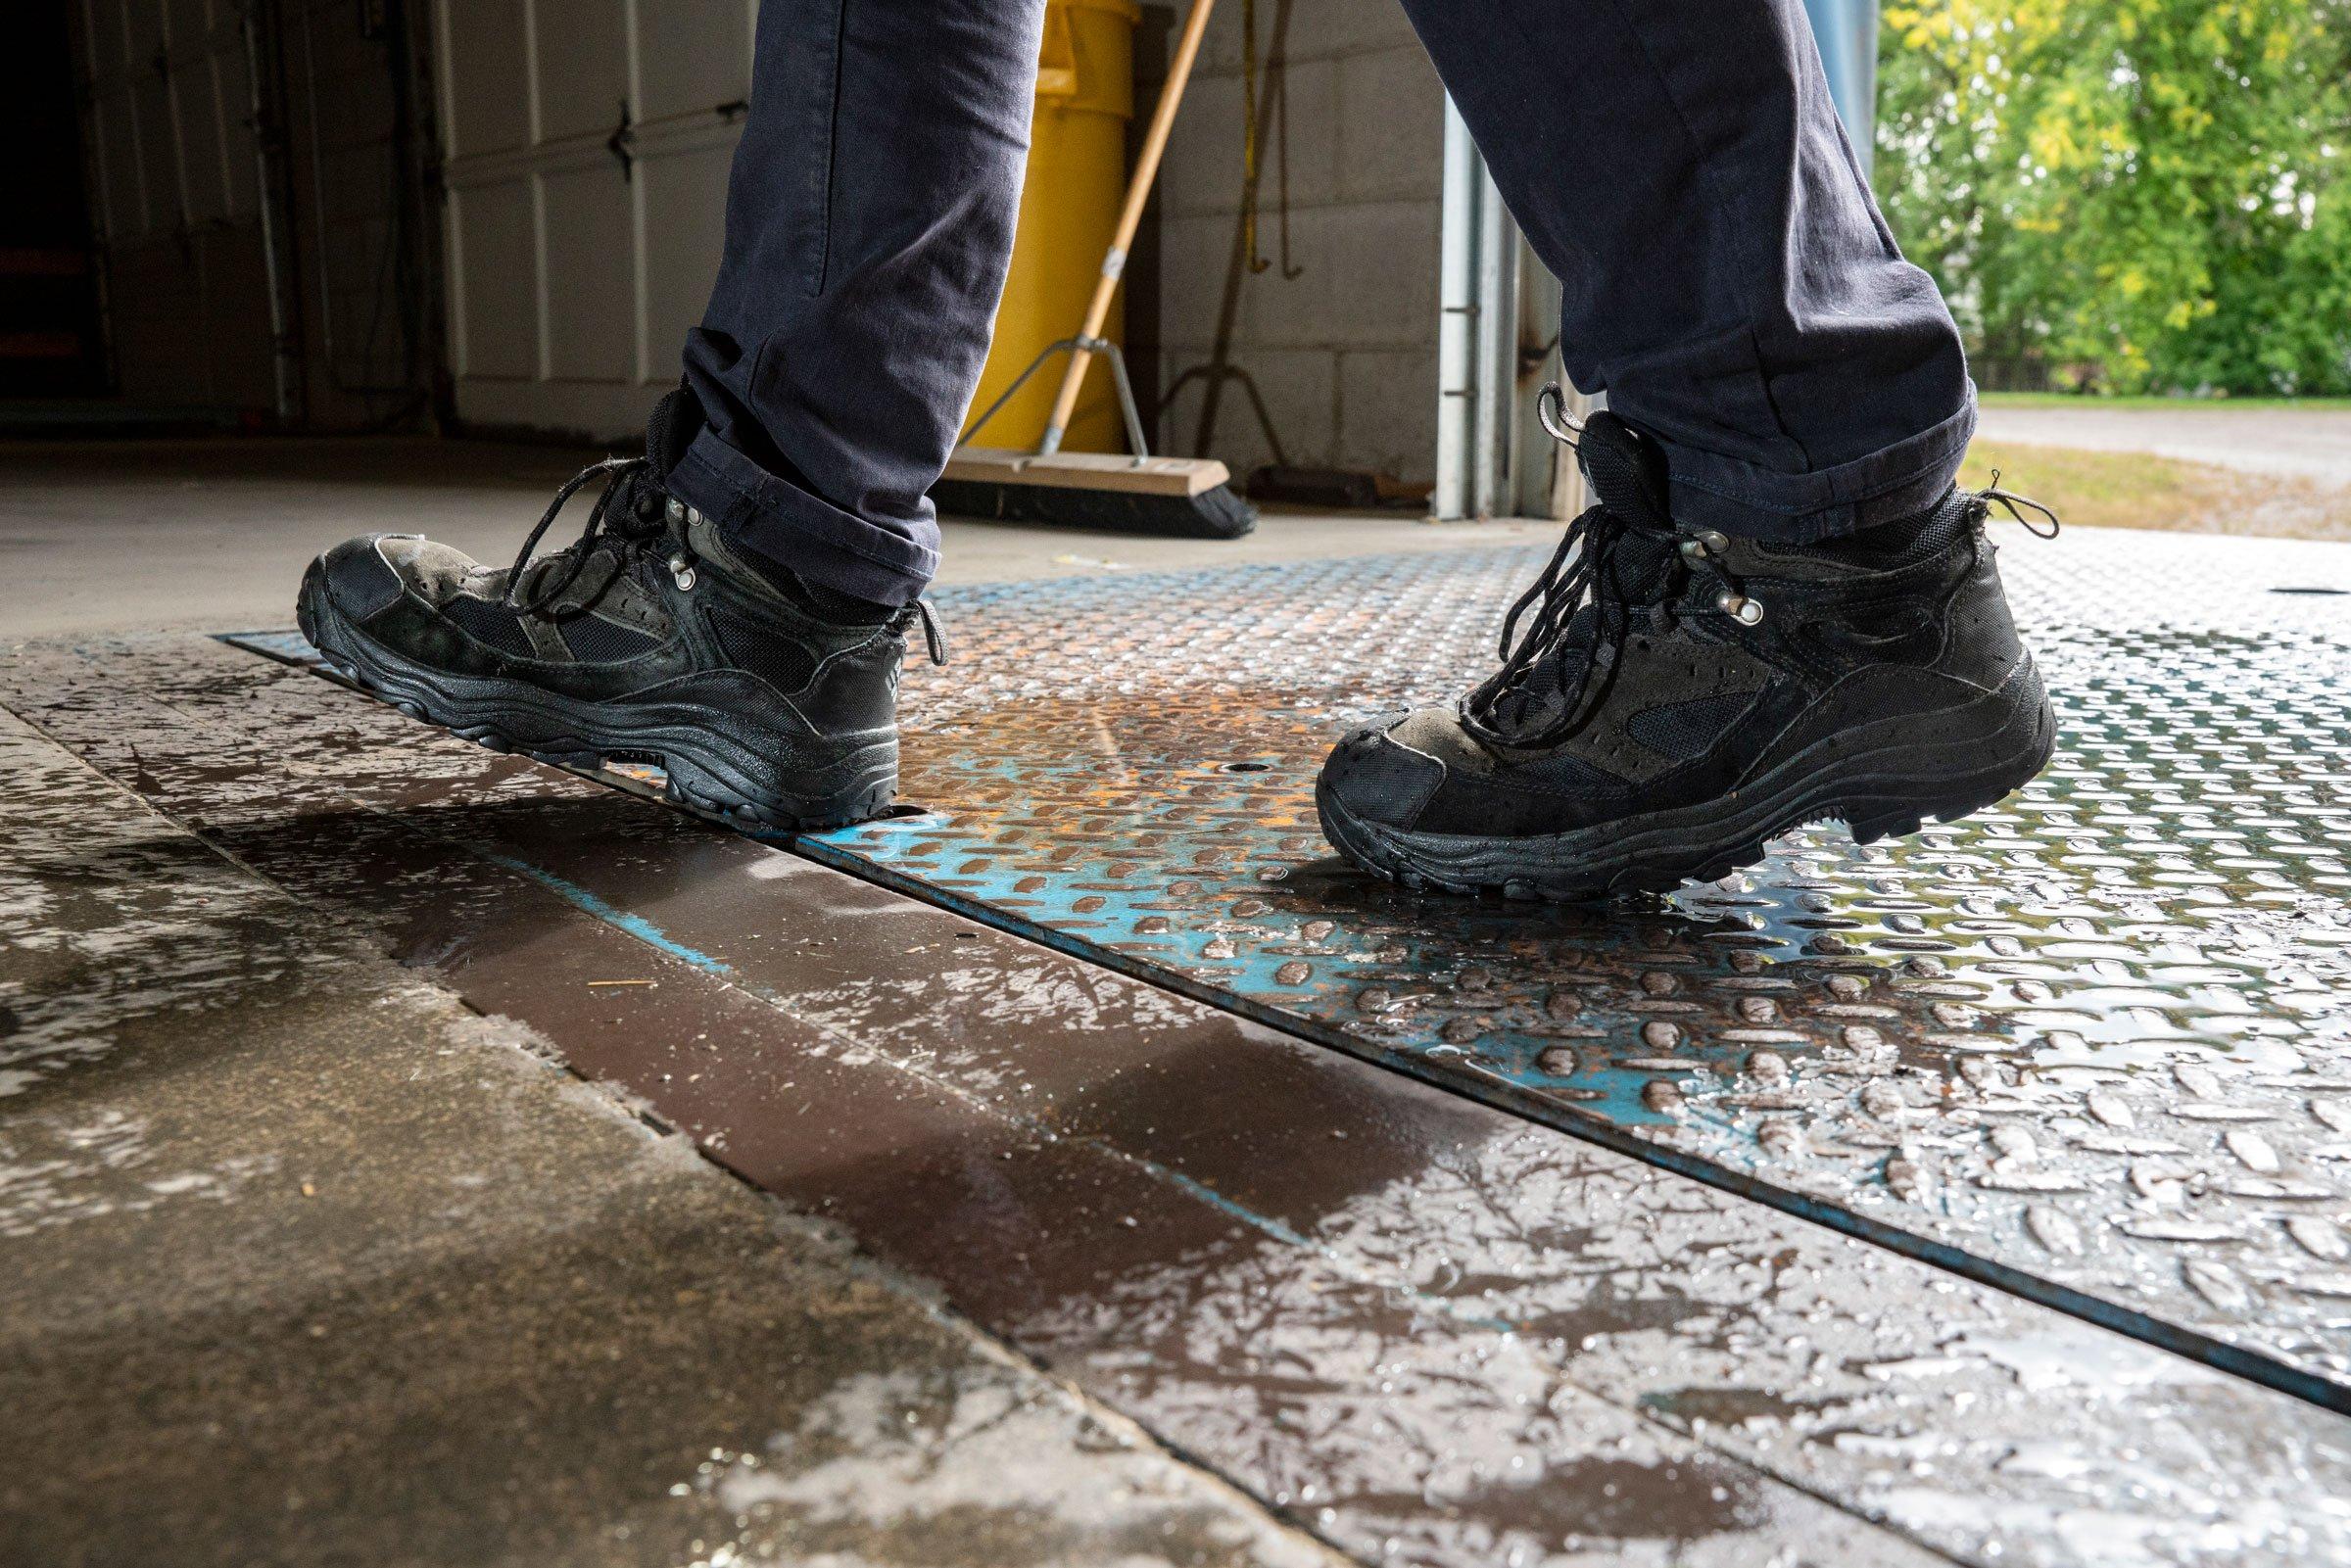 black-boots-walking-on-shop-floor